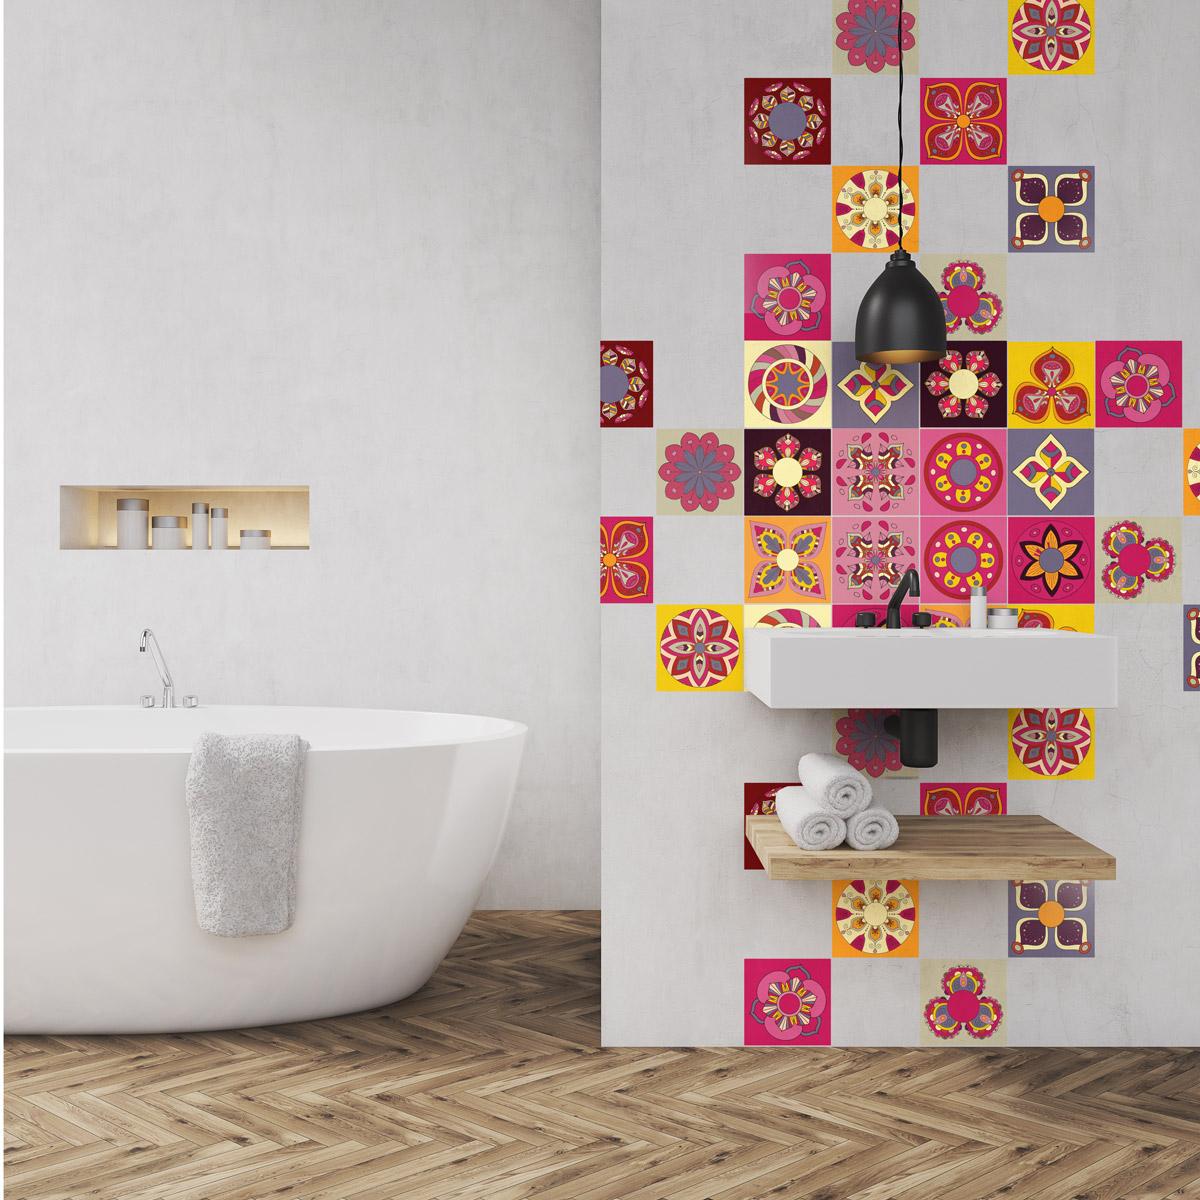 24 stickers carrelages azulejos porto alegre cuisine. Black Bedroom Furniture Sets. Home Design Ideas